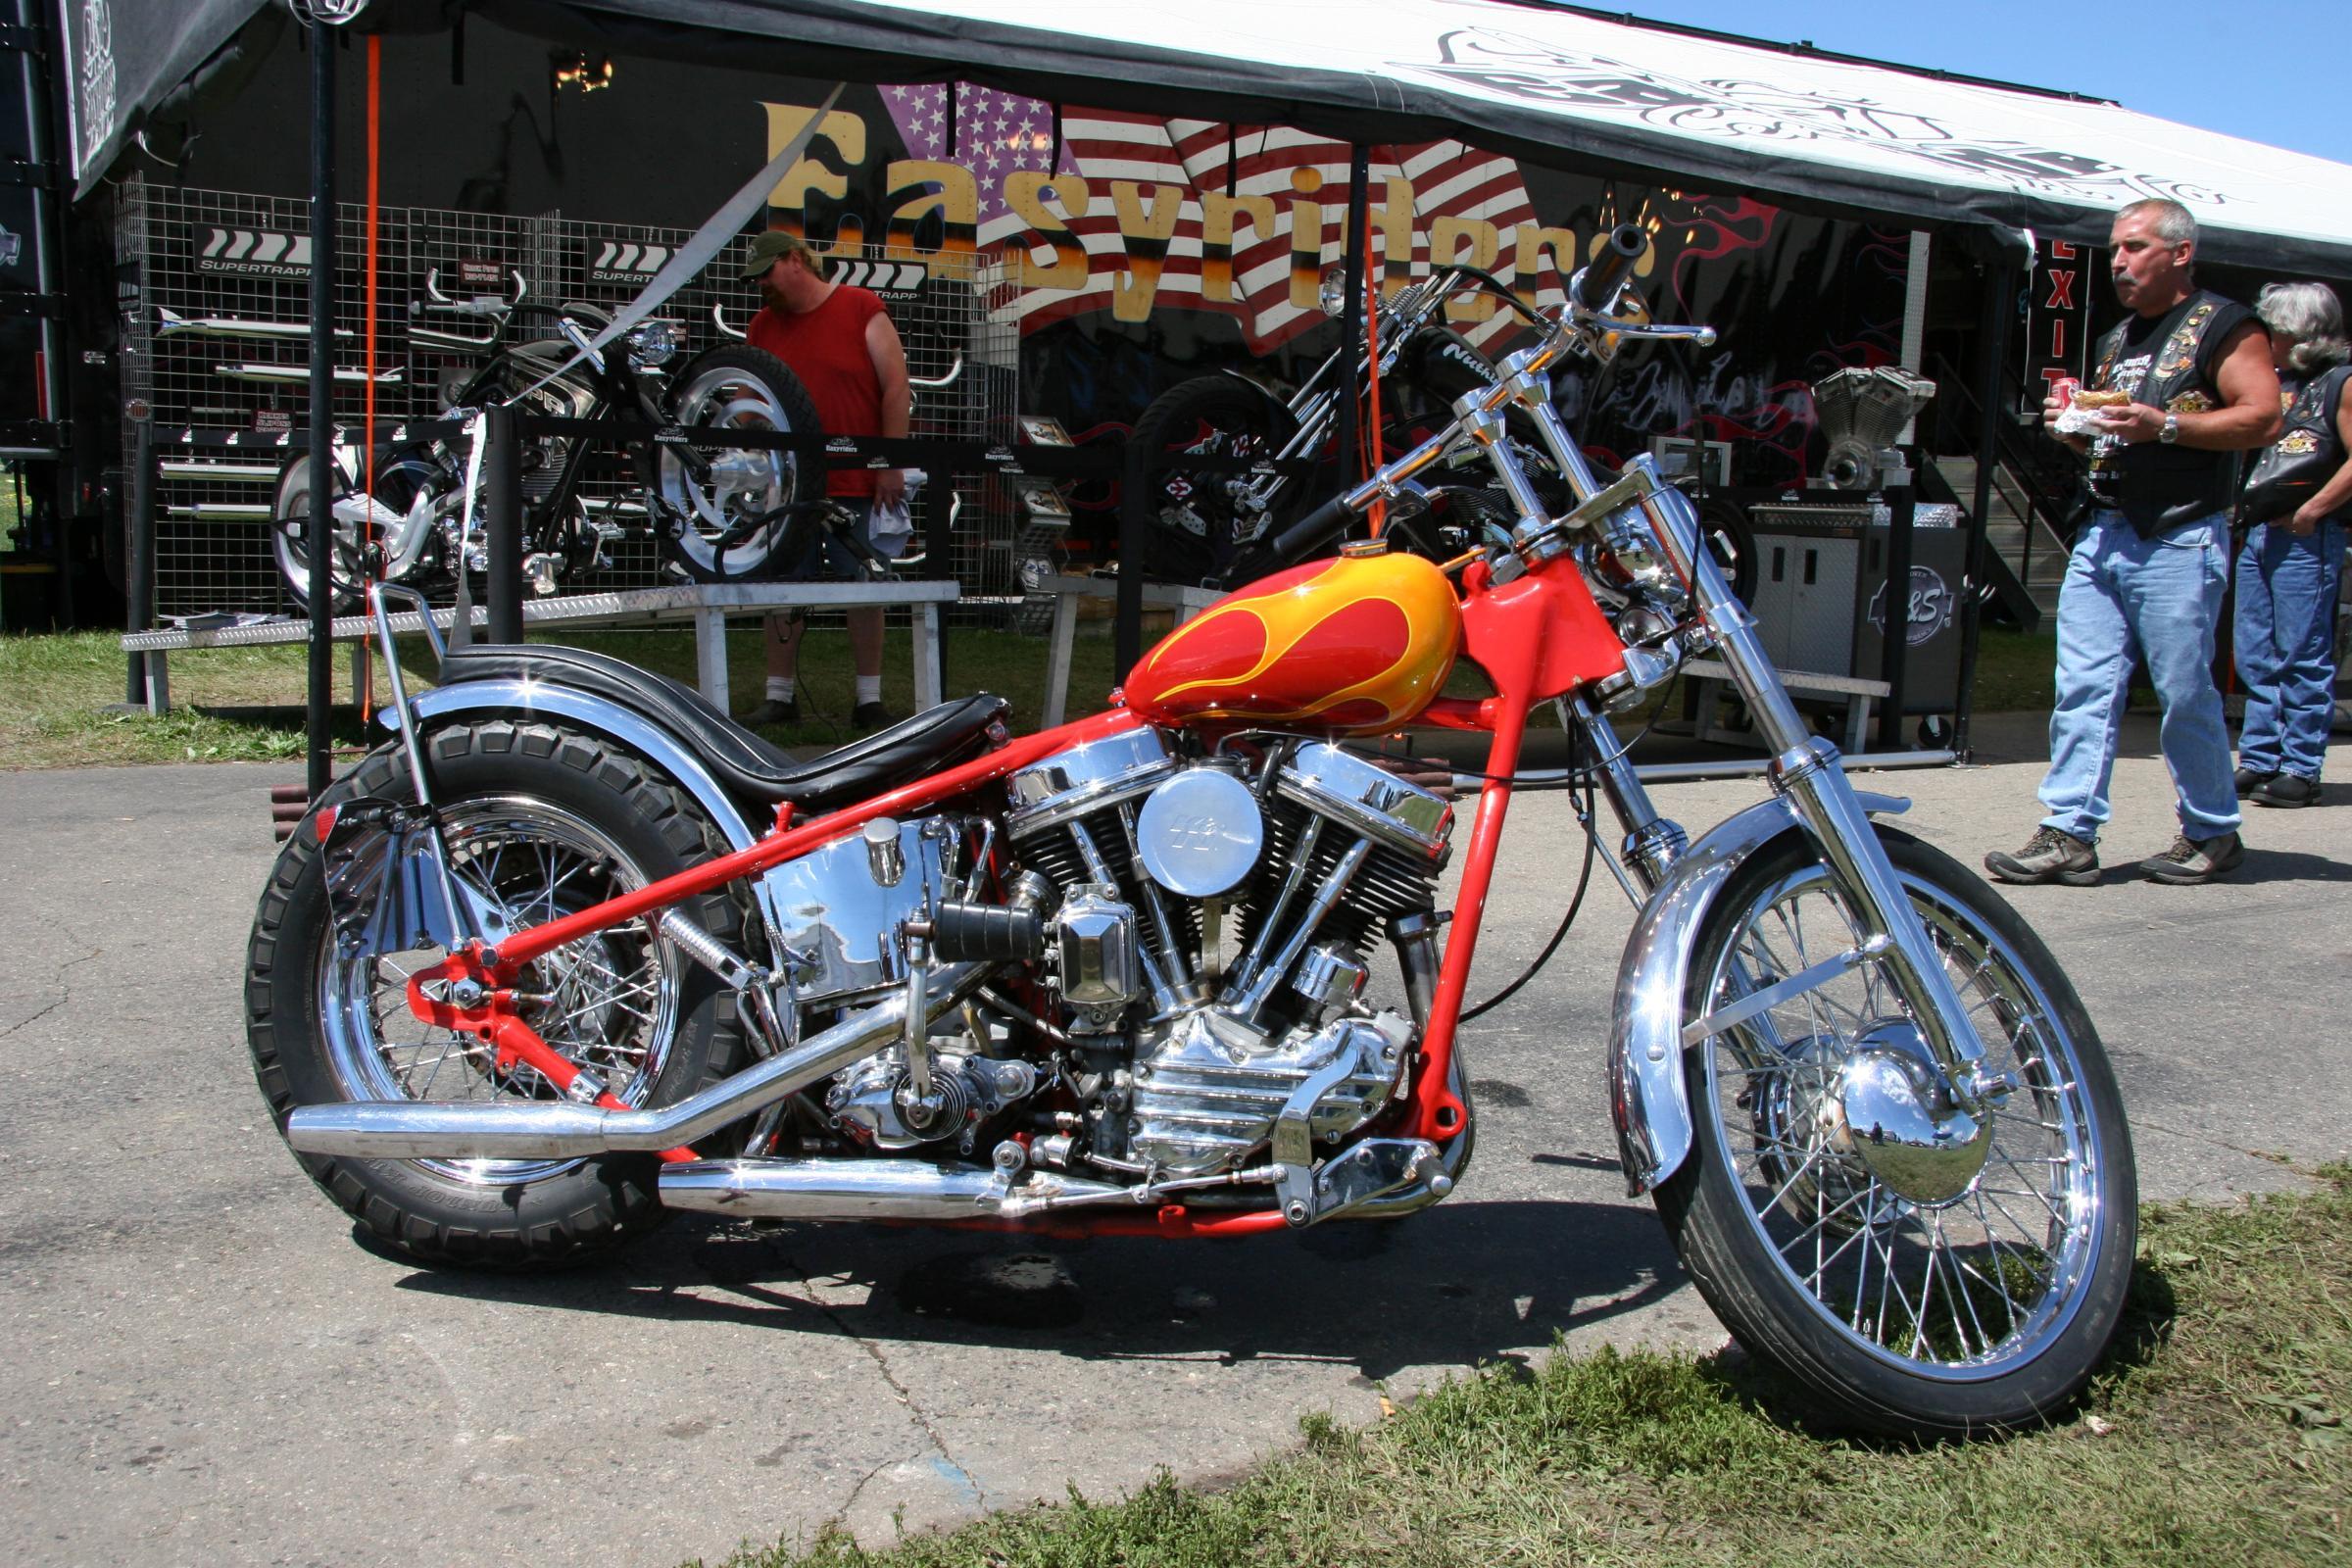 Chopper Custom Moto Wallpaper 2400x1600